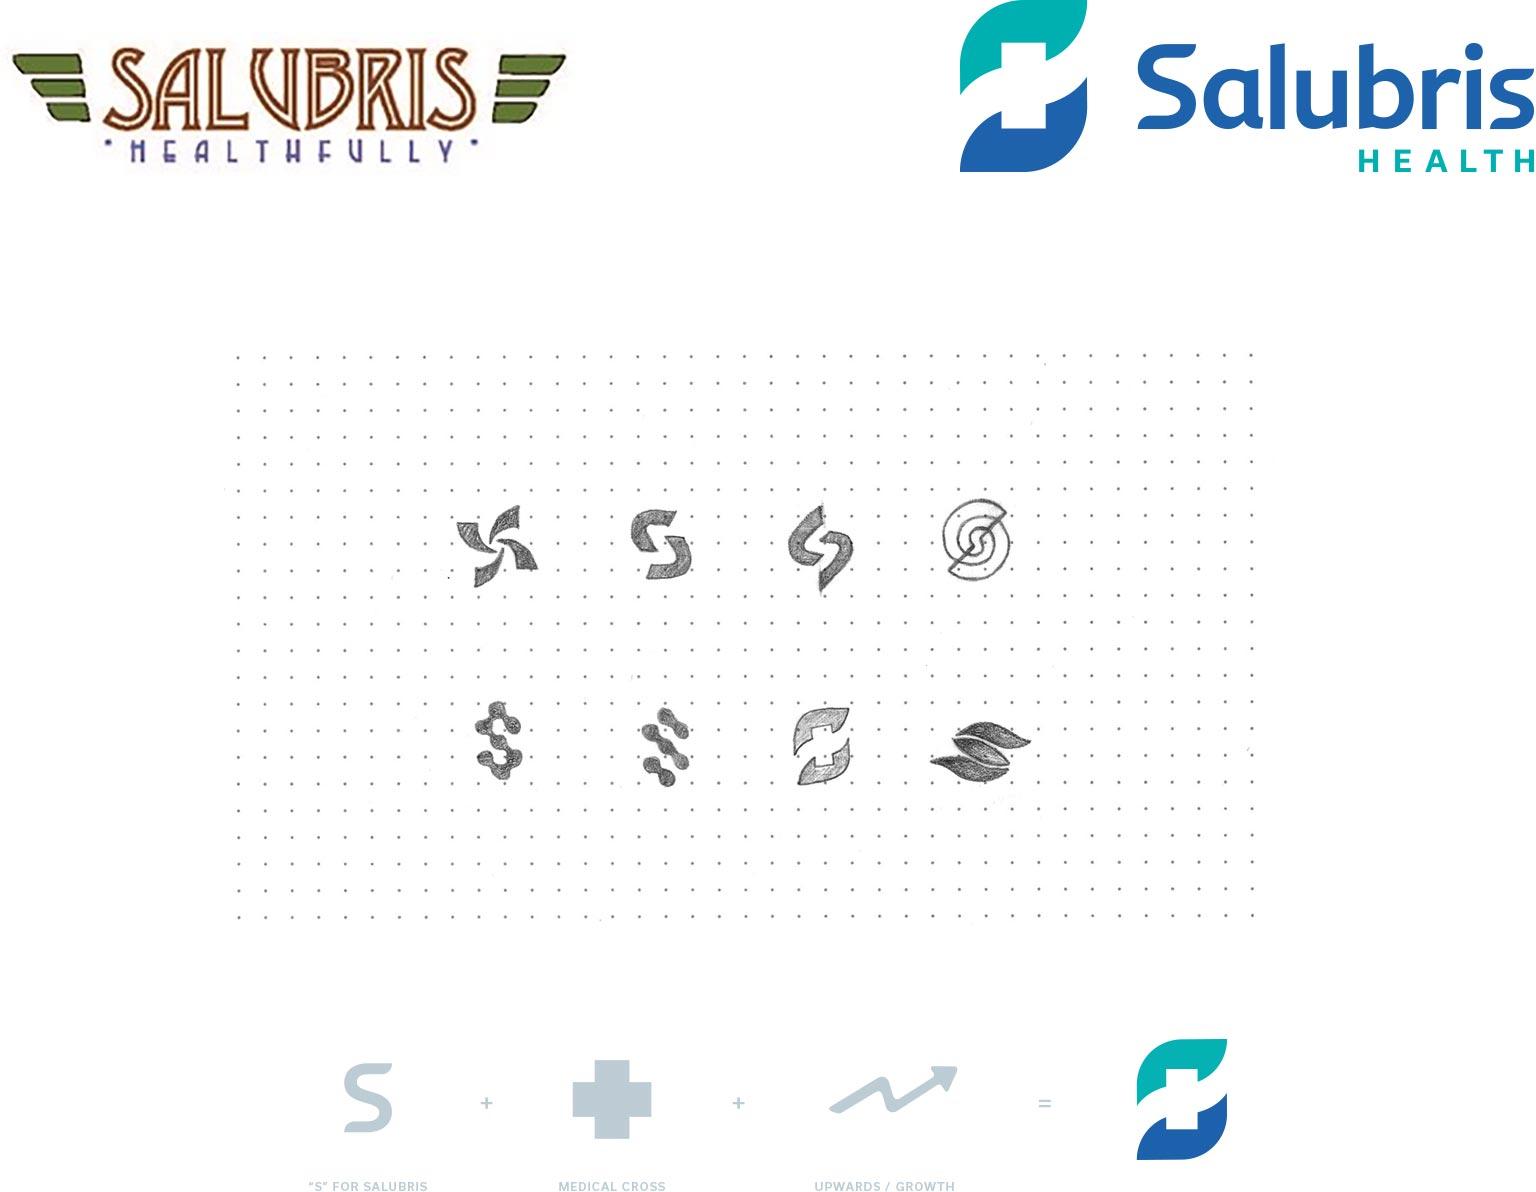 Salubris logo creation process